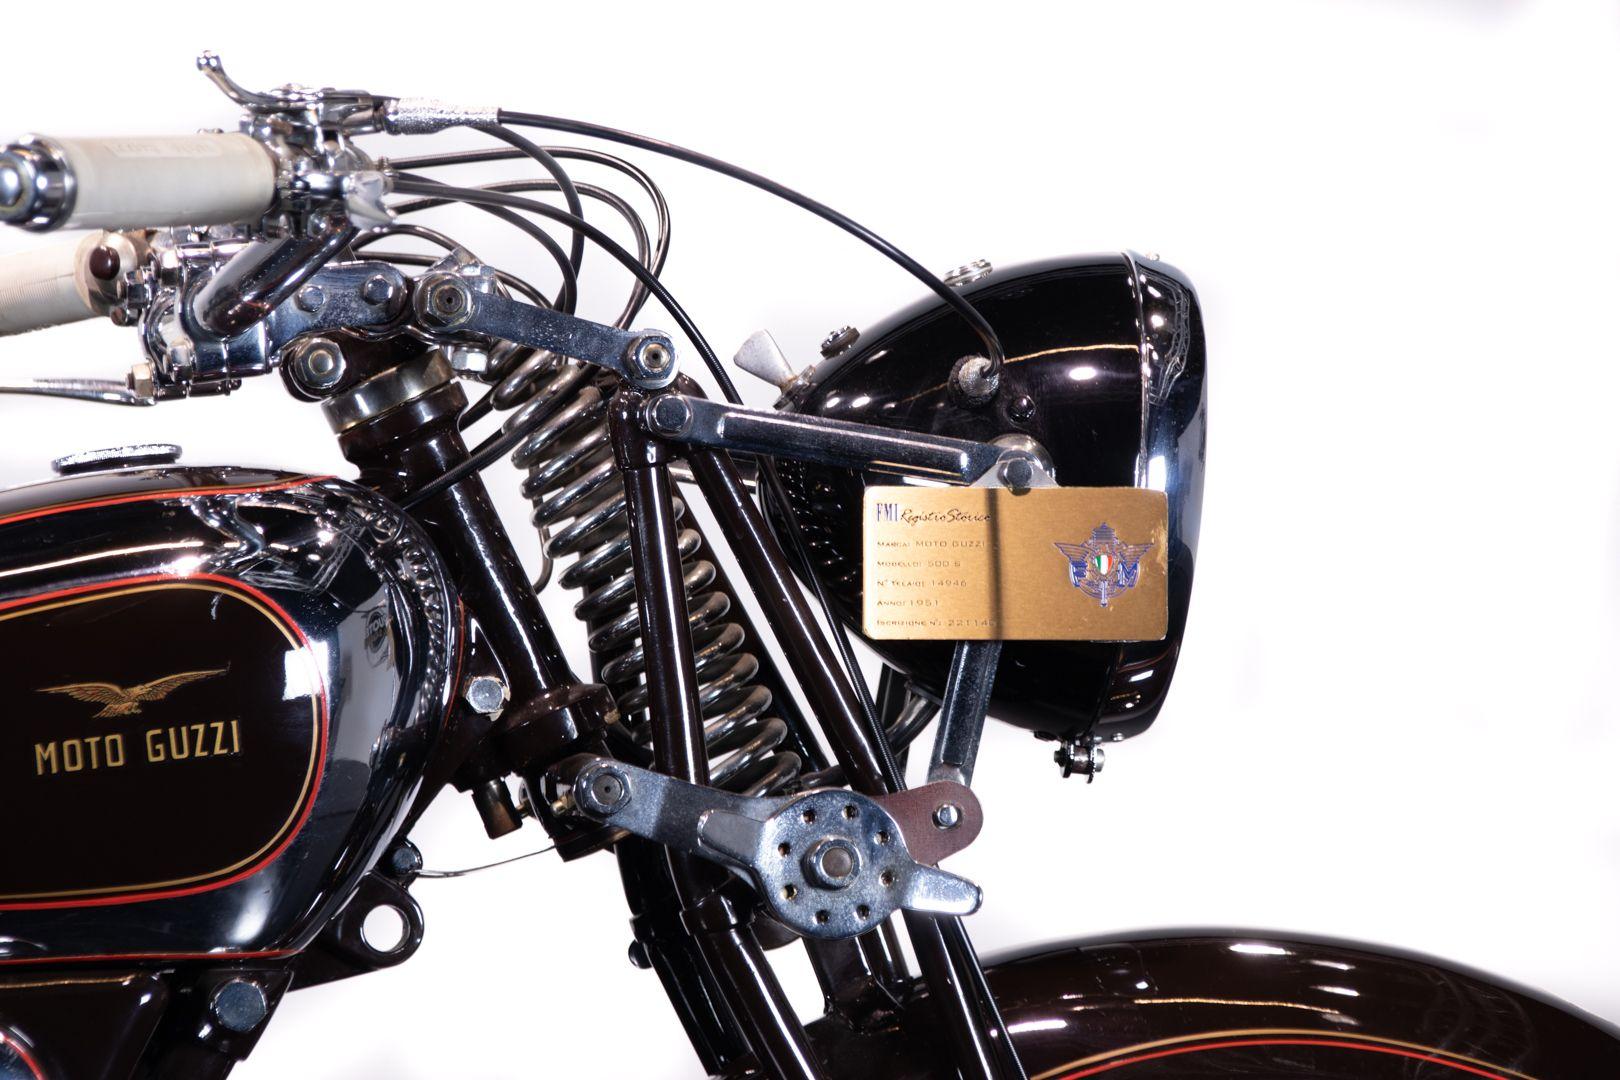 1951 Moto Guzzi 500 72188